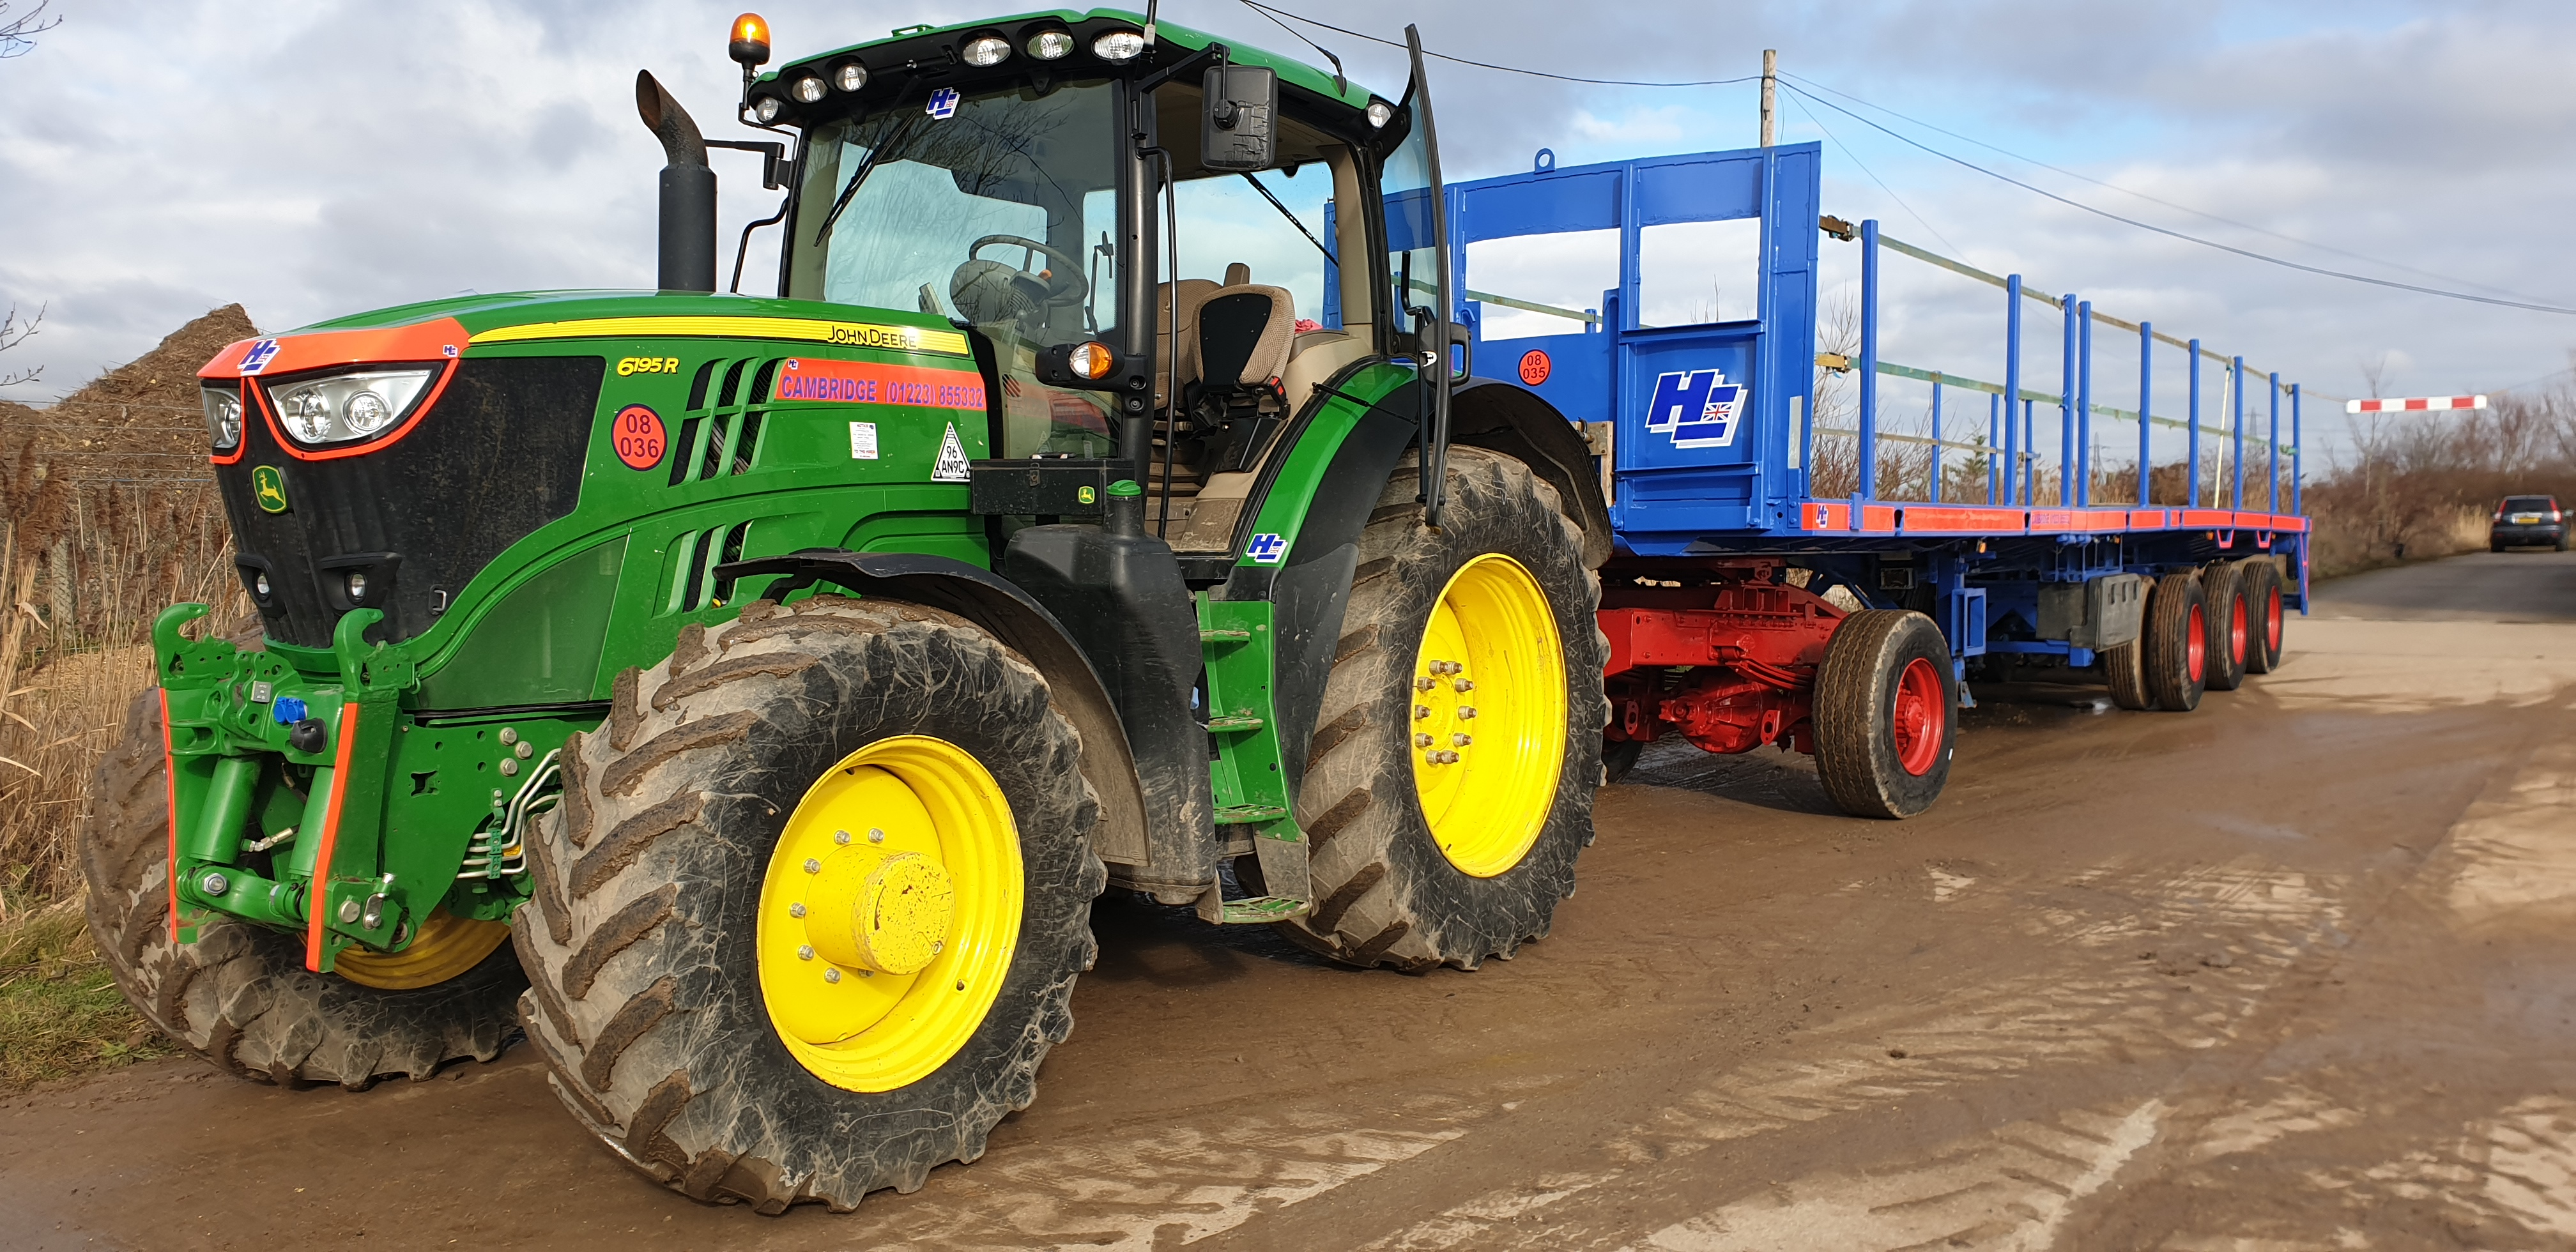 John Deere 6R Series Tractor Hire